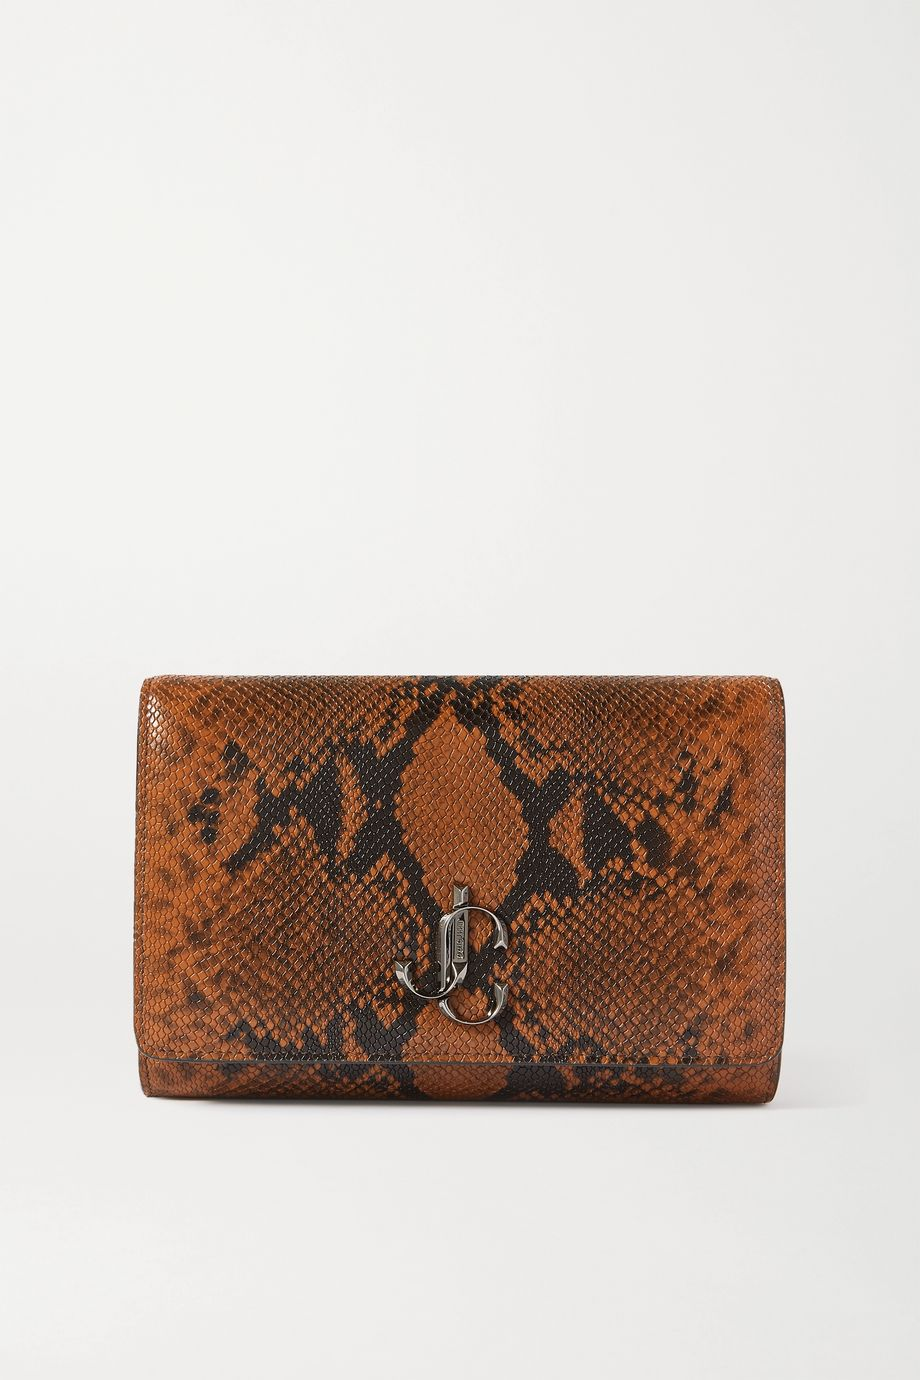 Jimmy Choo Varenne snake-effect leather clutch